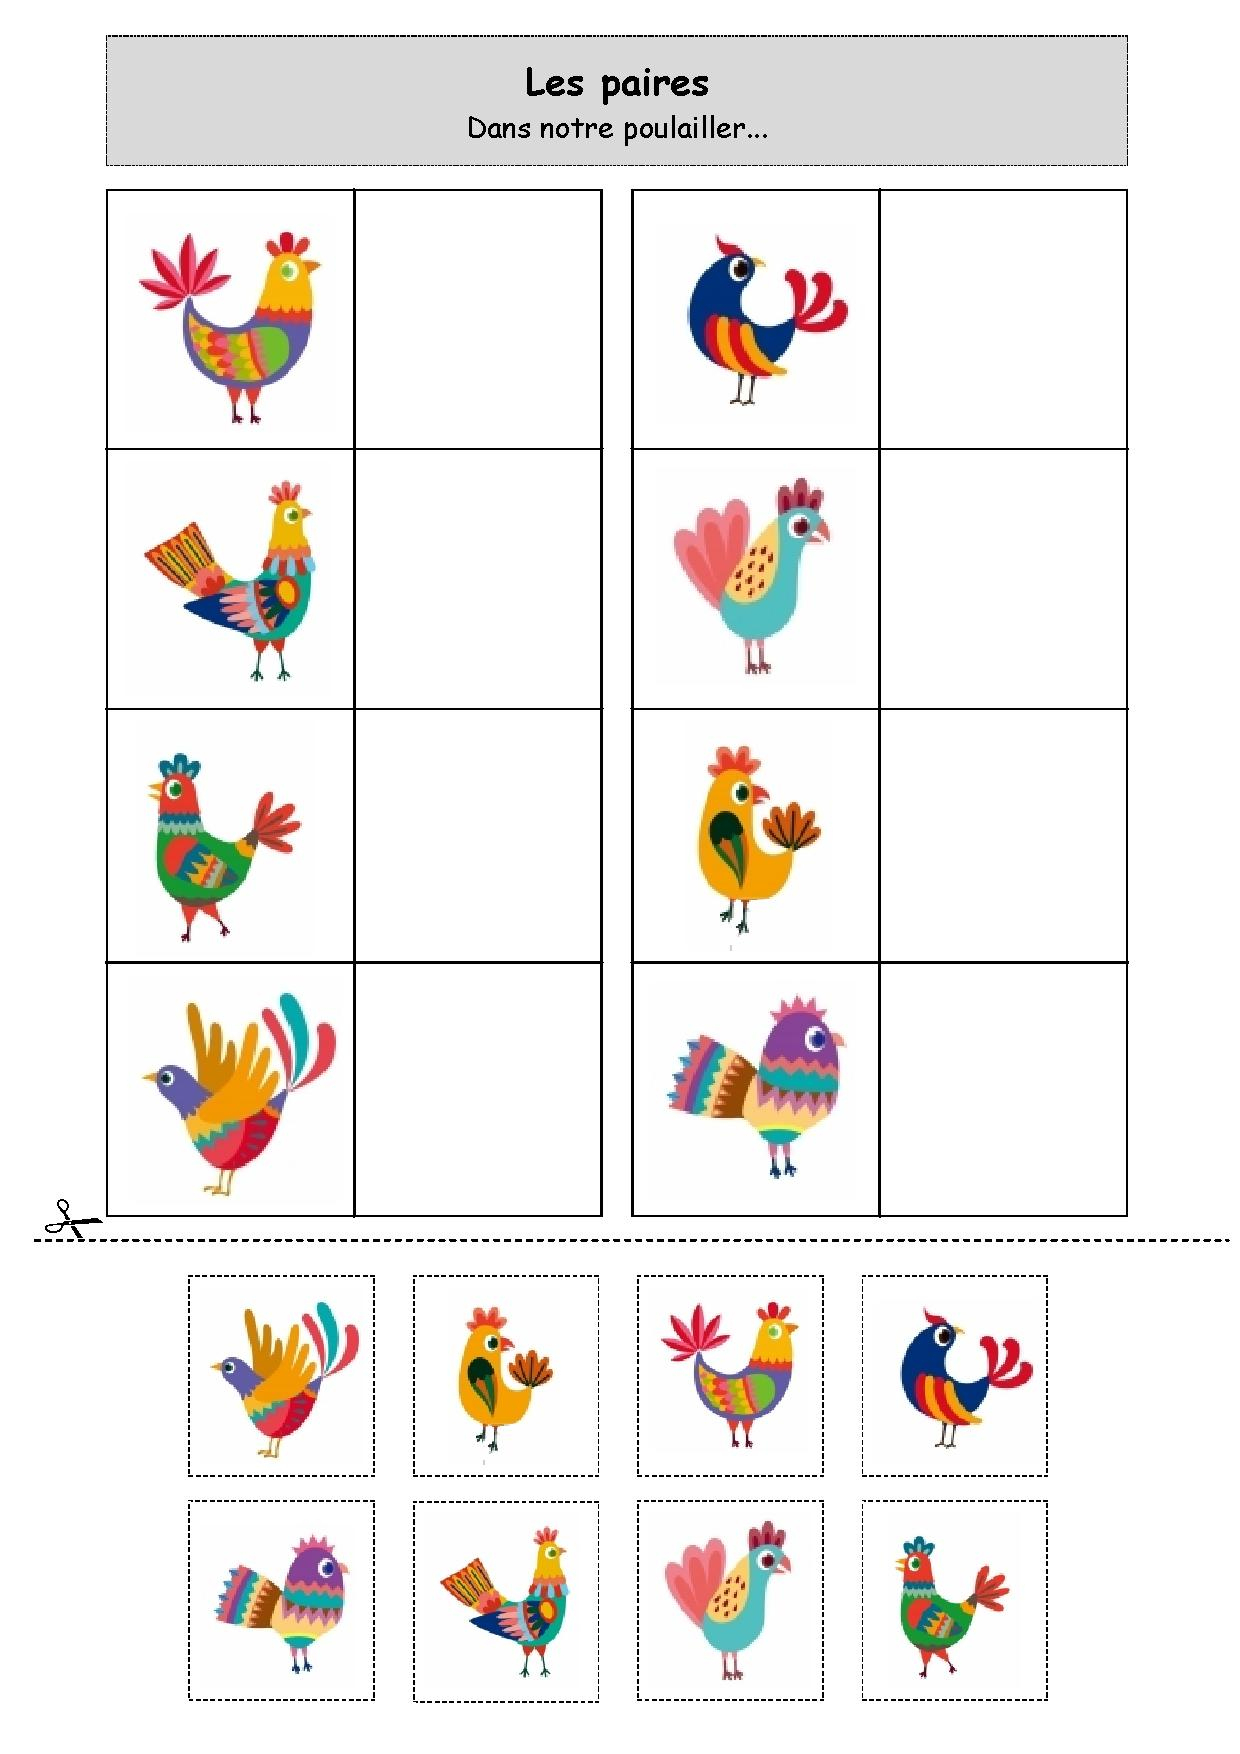 Modèles Tangram | à Jeu De Tangram À Imprimer